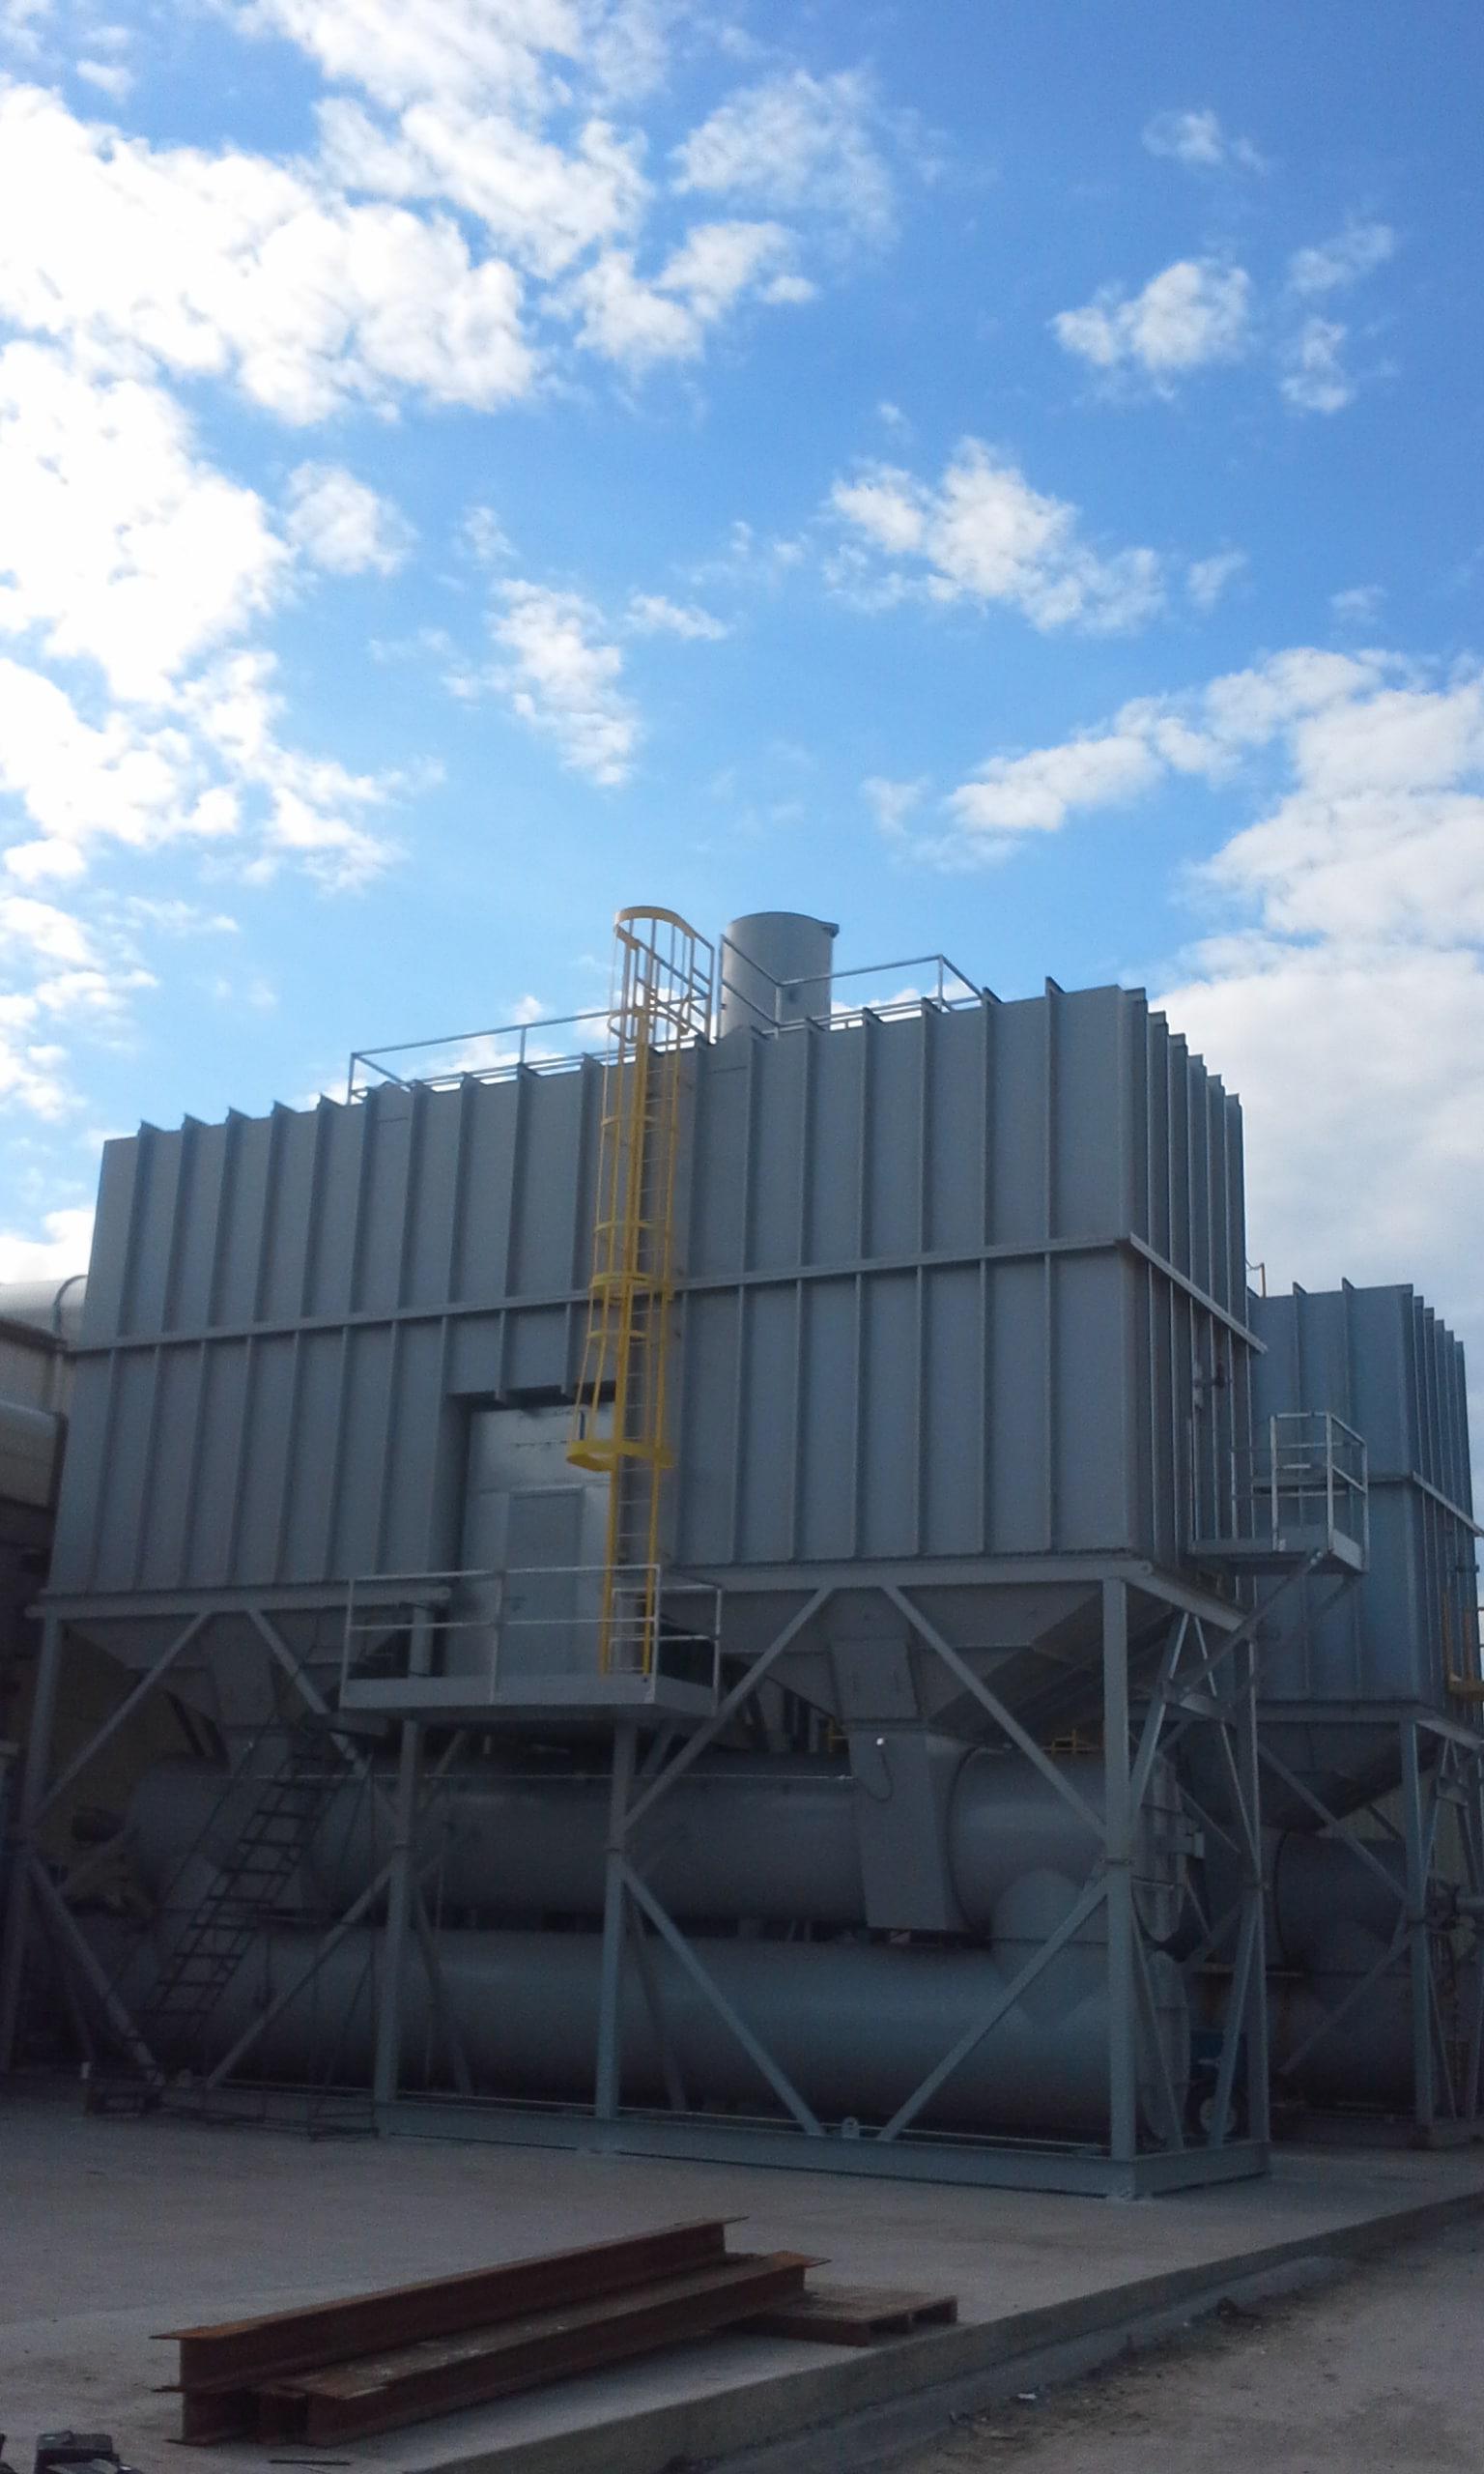 60000 SCFM再生热氧化剂